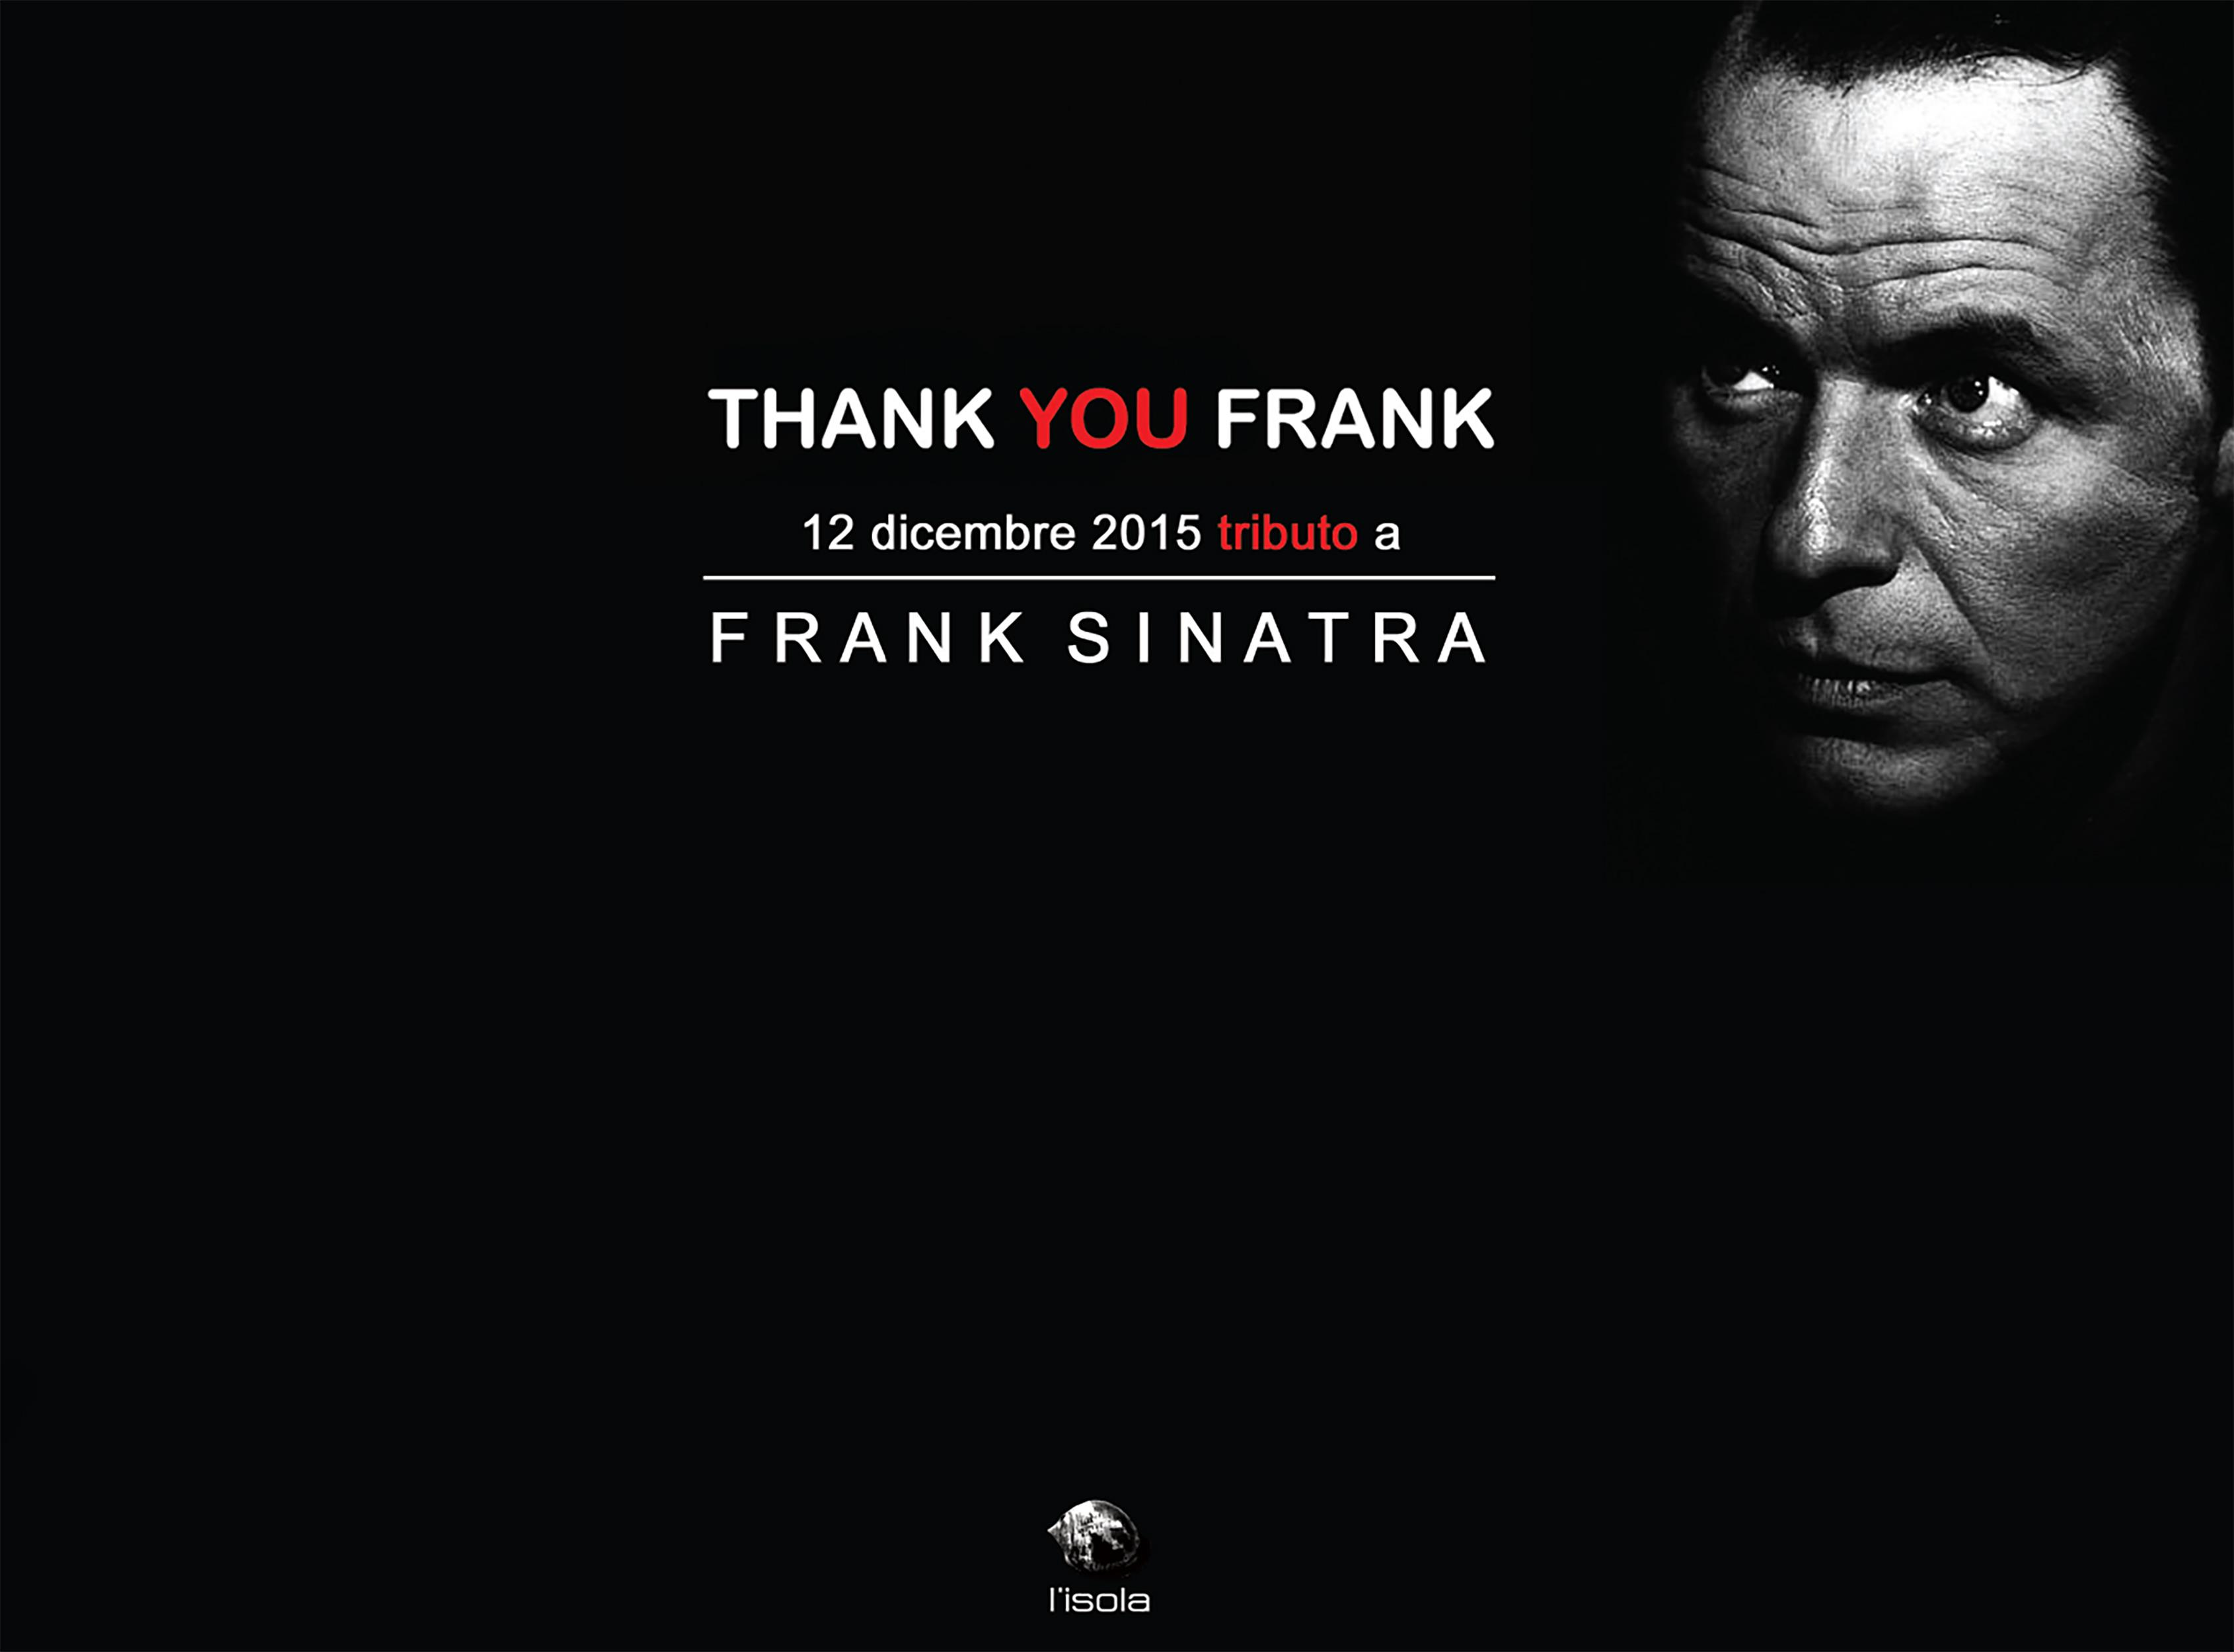 Thank you Frank